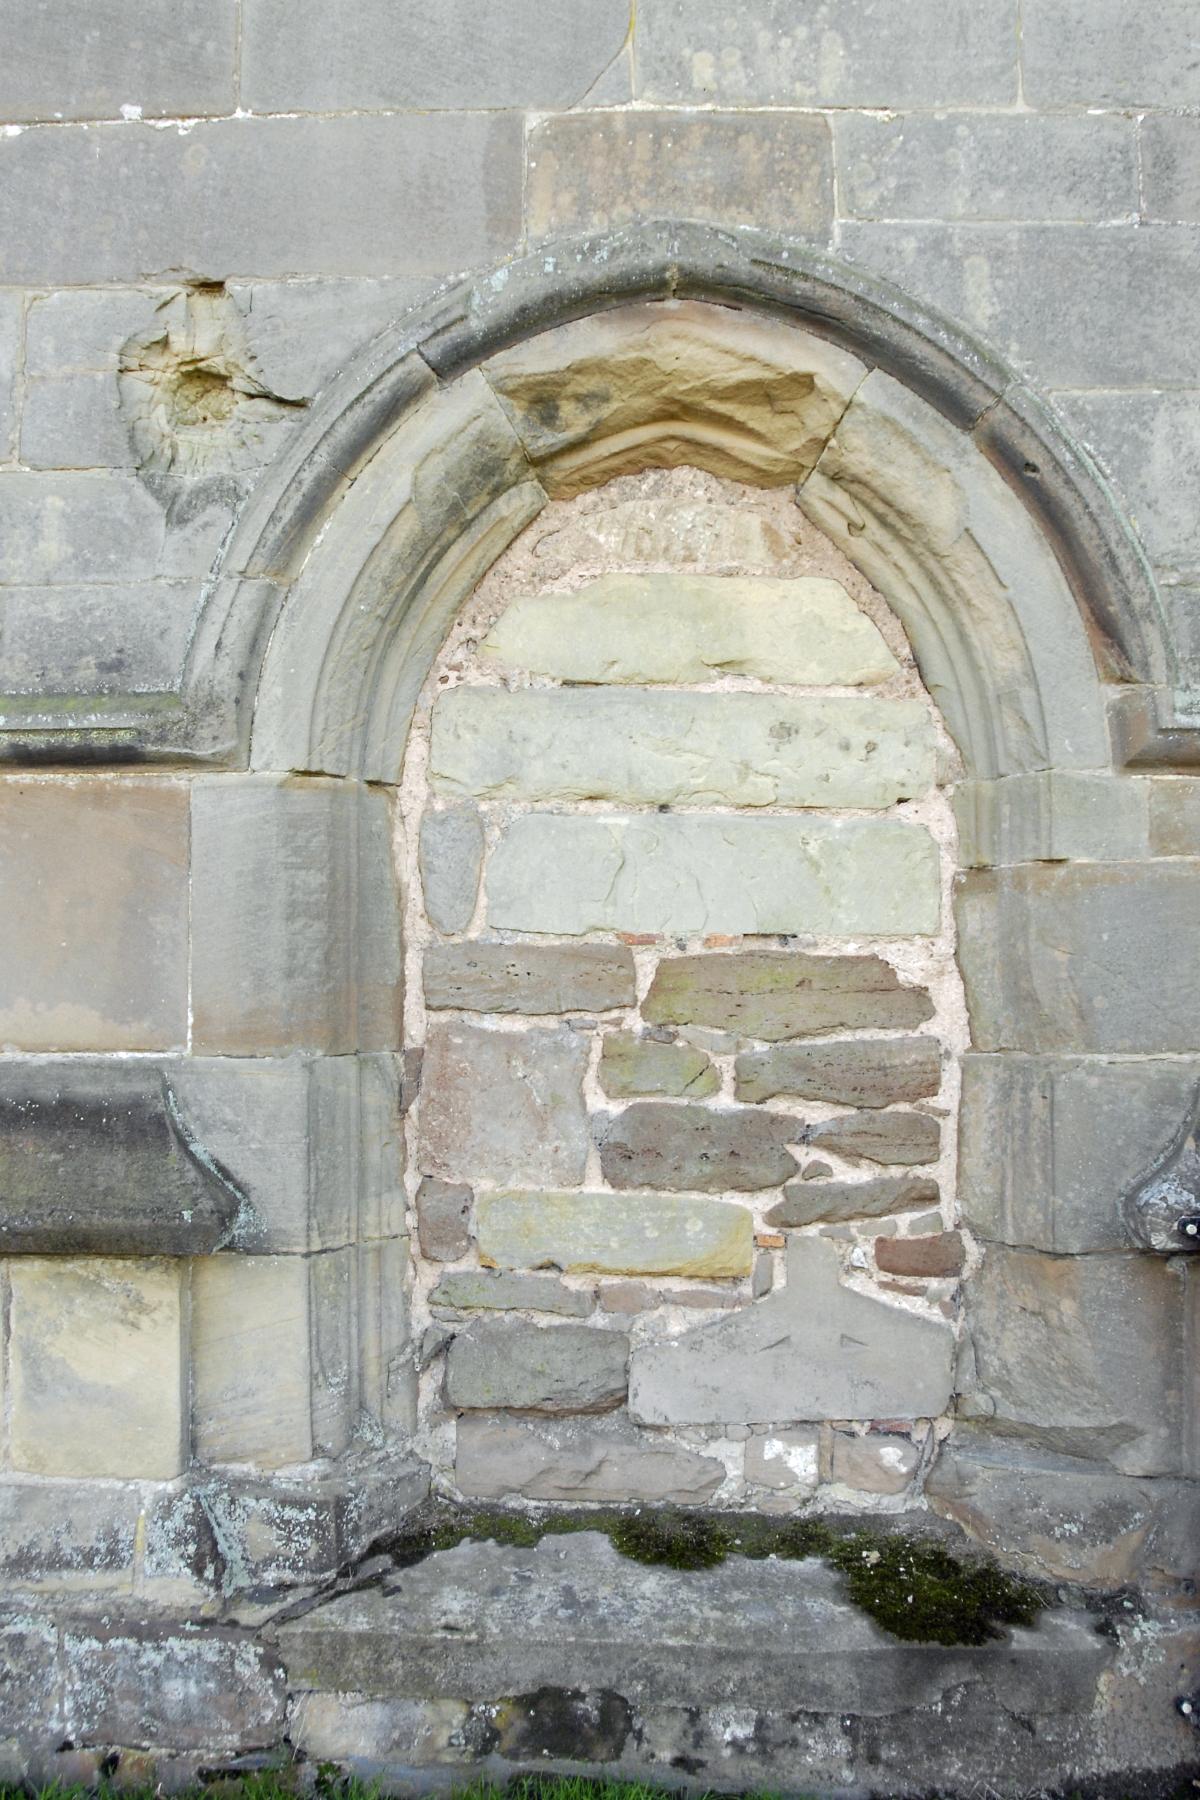 File:North Door of St Bartholomew's Church in Tong, Shropshire.jpg